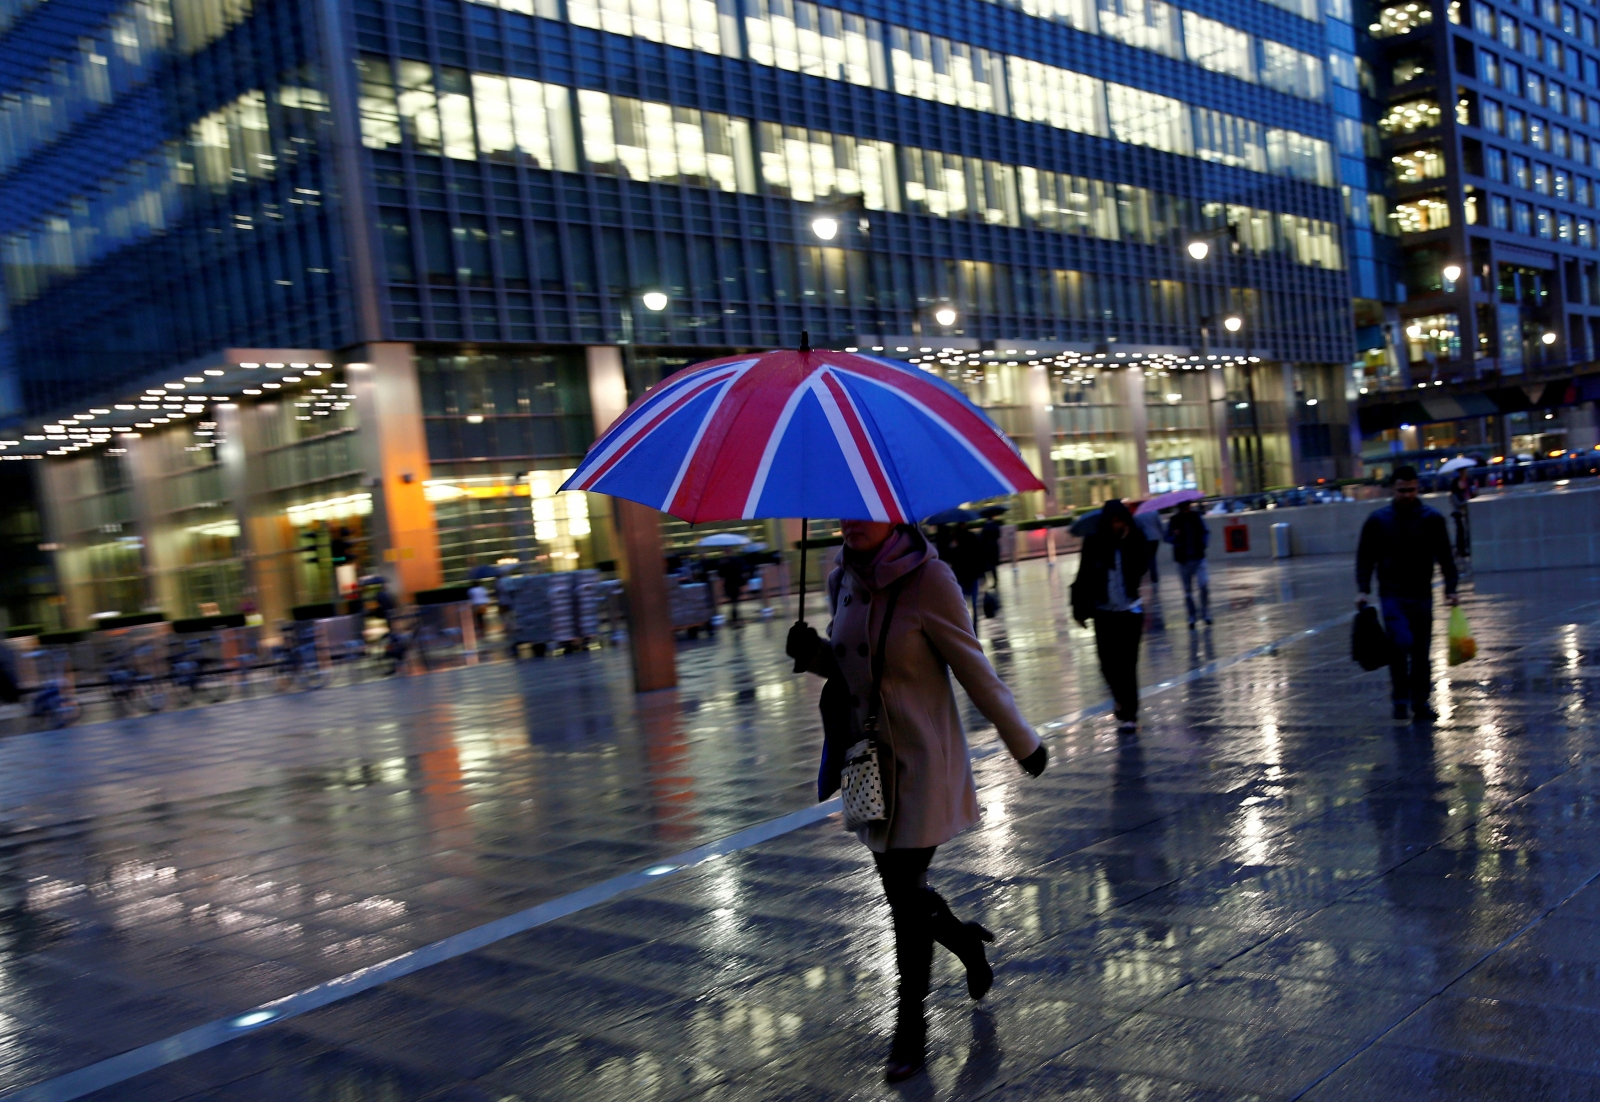 UK umbrella in Canary Wharf